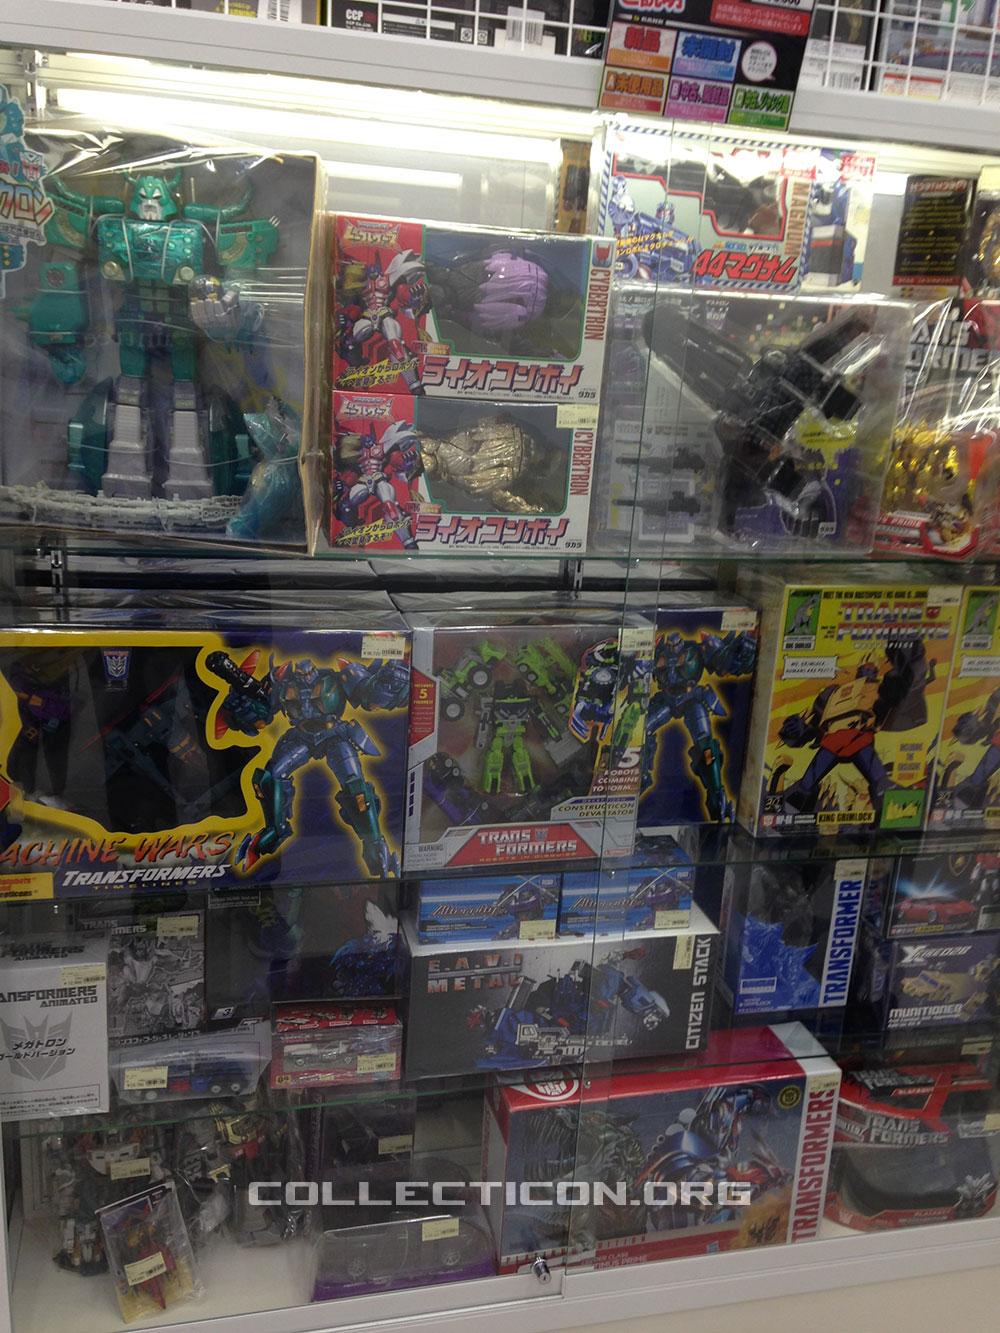 02-akihabara-jungle-luckydraw-transformers-case